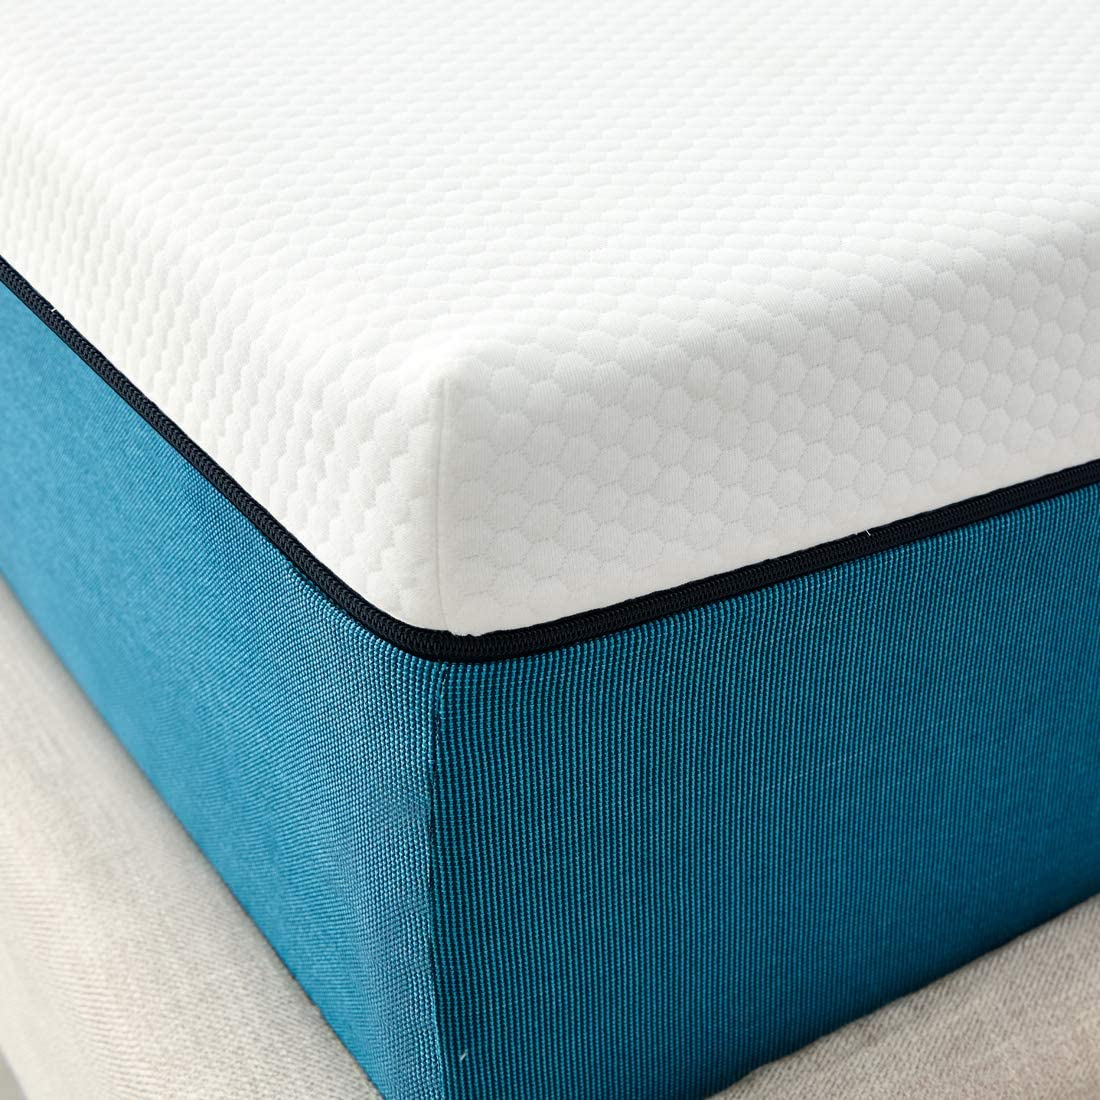 Iyee Nature 8 inch Cooling Gel Memory Foam Mattress in a Box Twin Mattress Foam Bed Mattress with CertiPUR-US Certified Medium Firm Foam Mattress for Sleep Supportive /& Pressure Relief